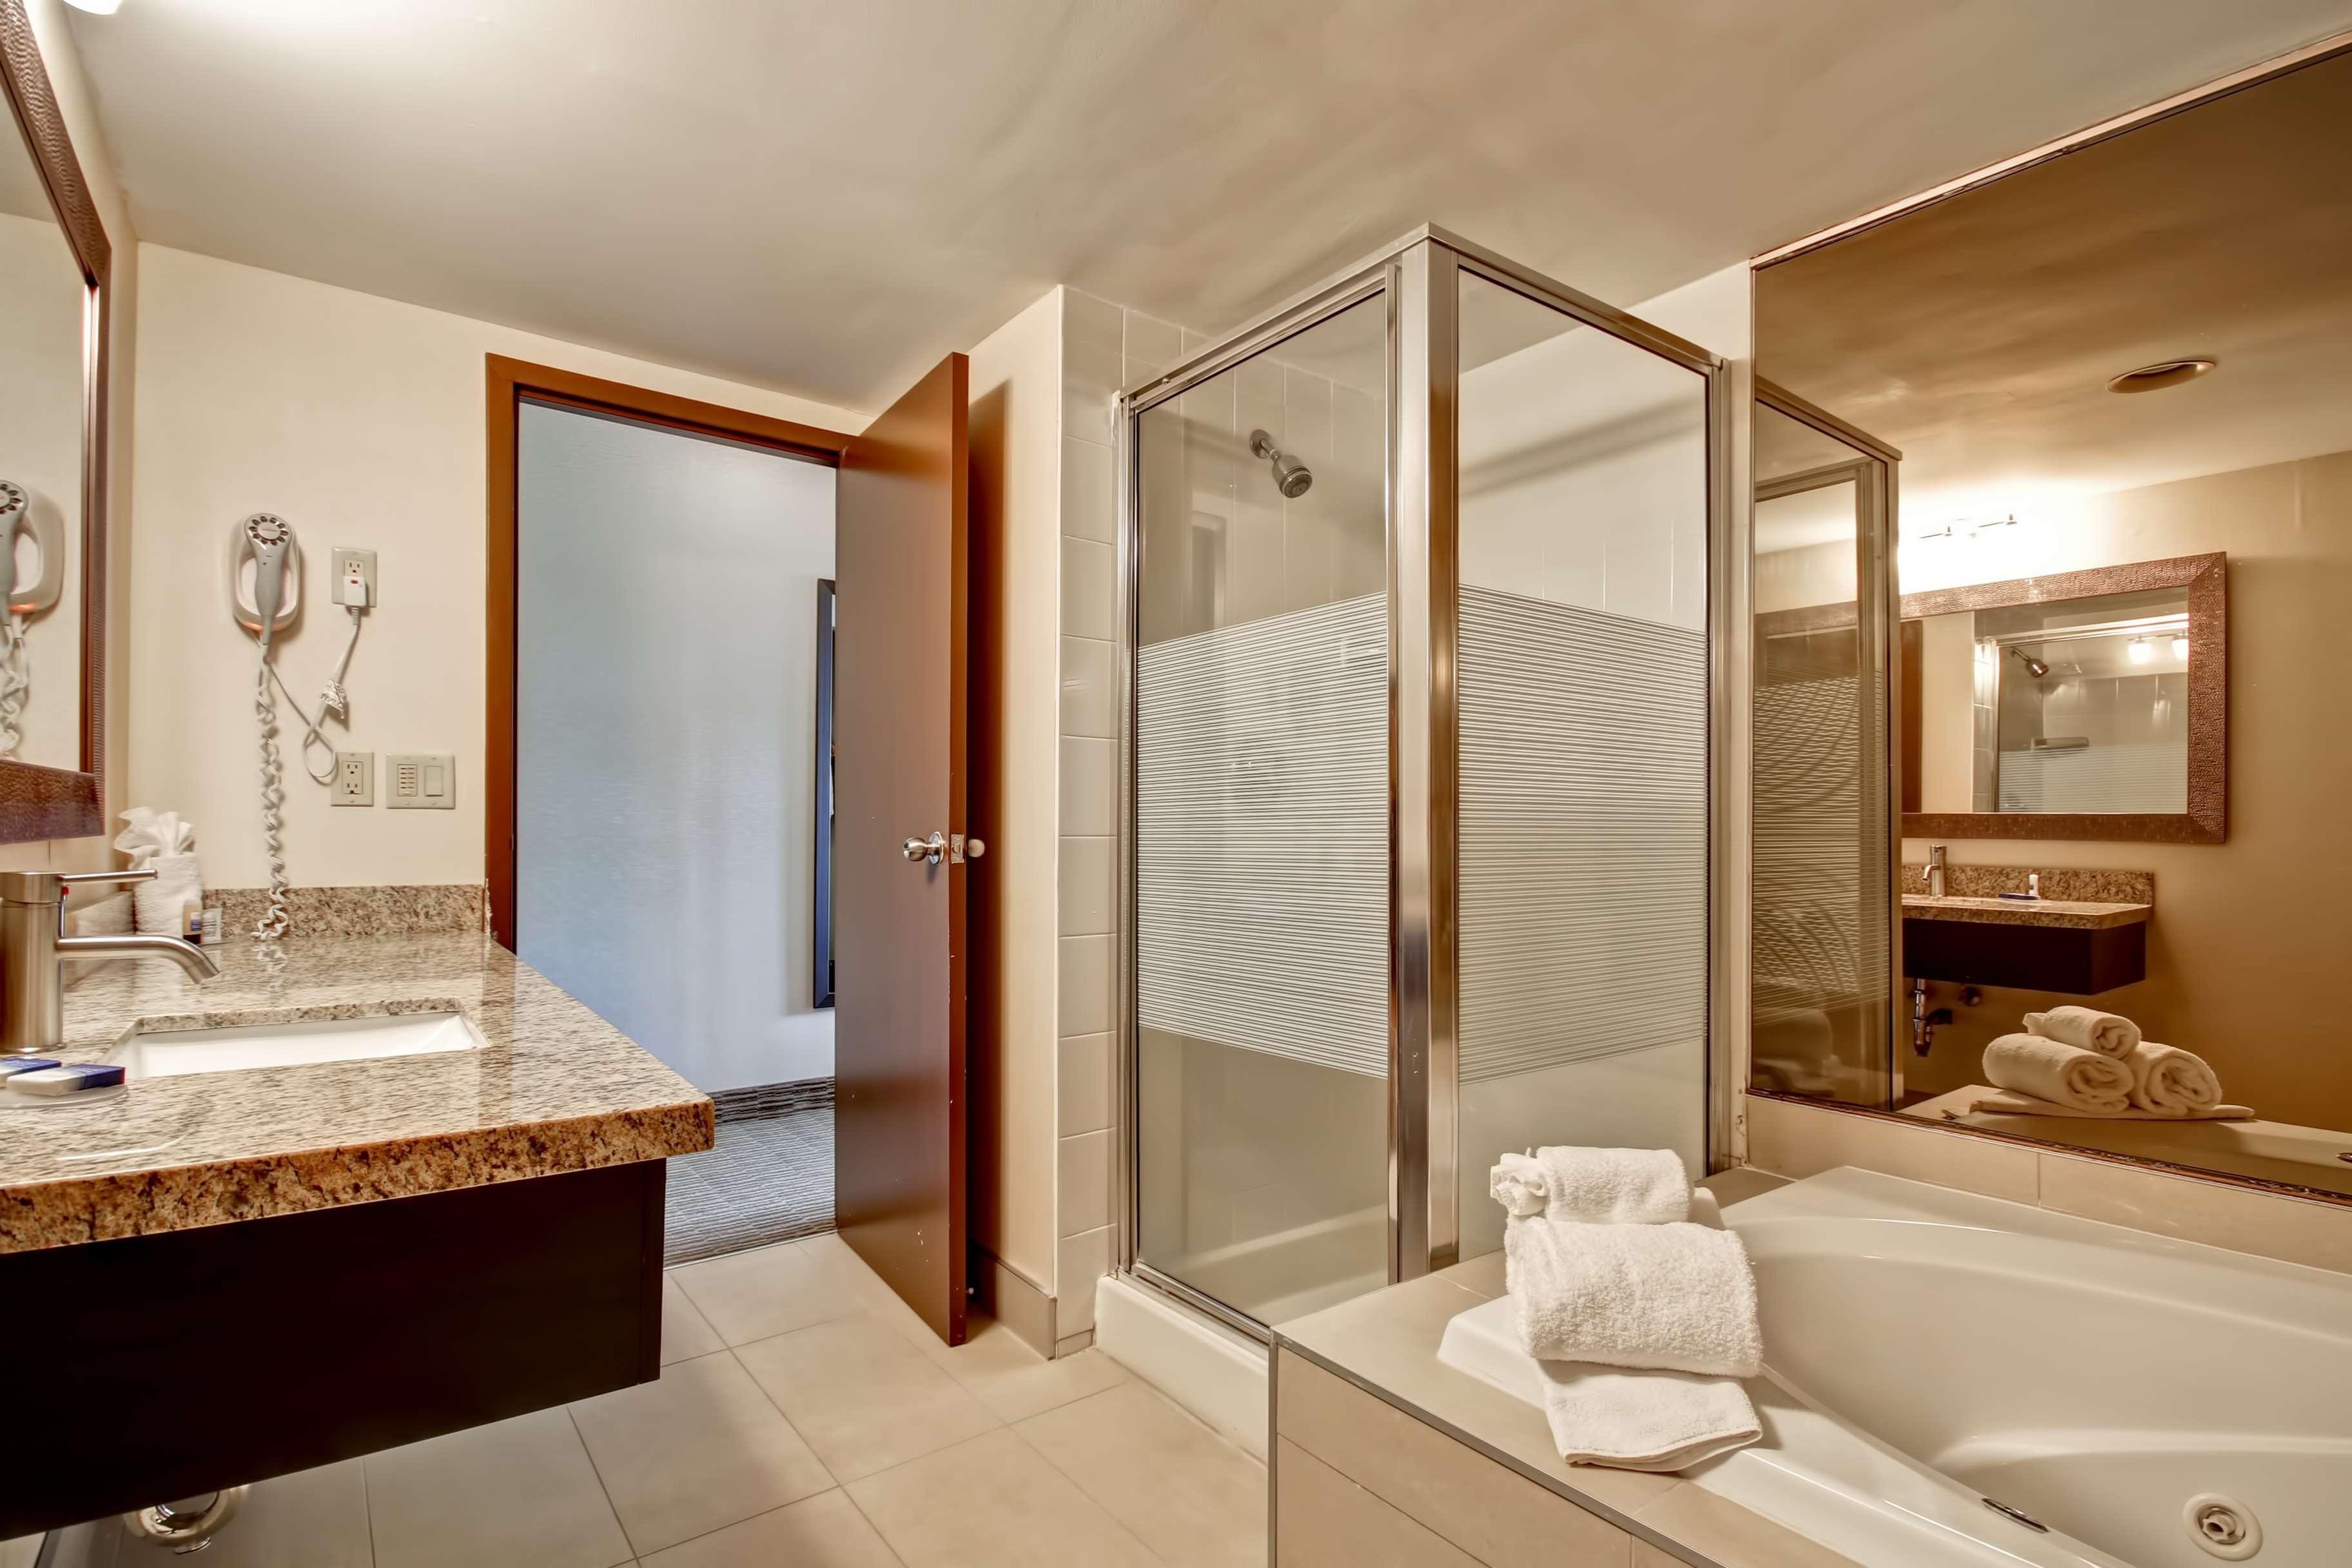 Best Western Little River Inn à Simcoe: King Suite Jet Tub Bathroom